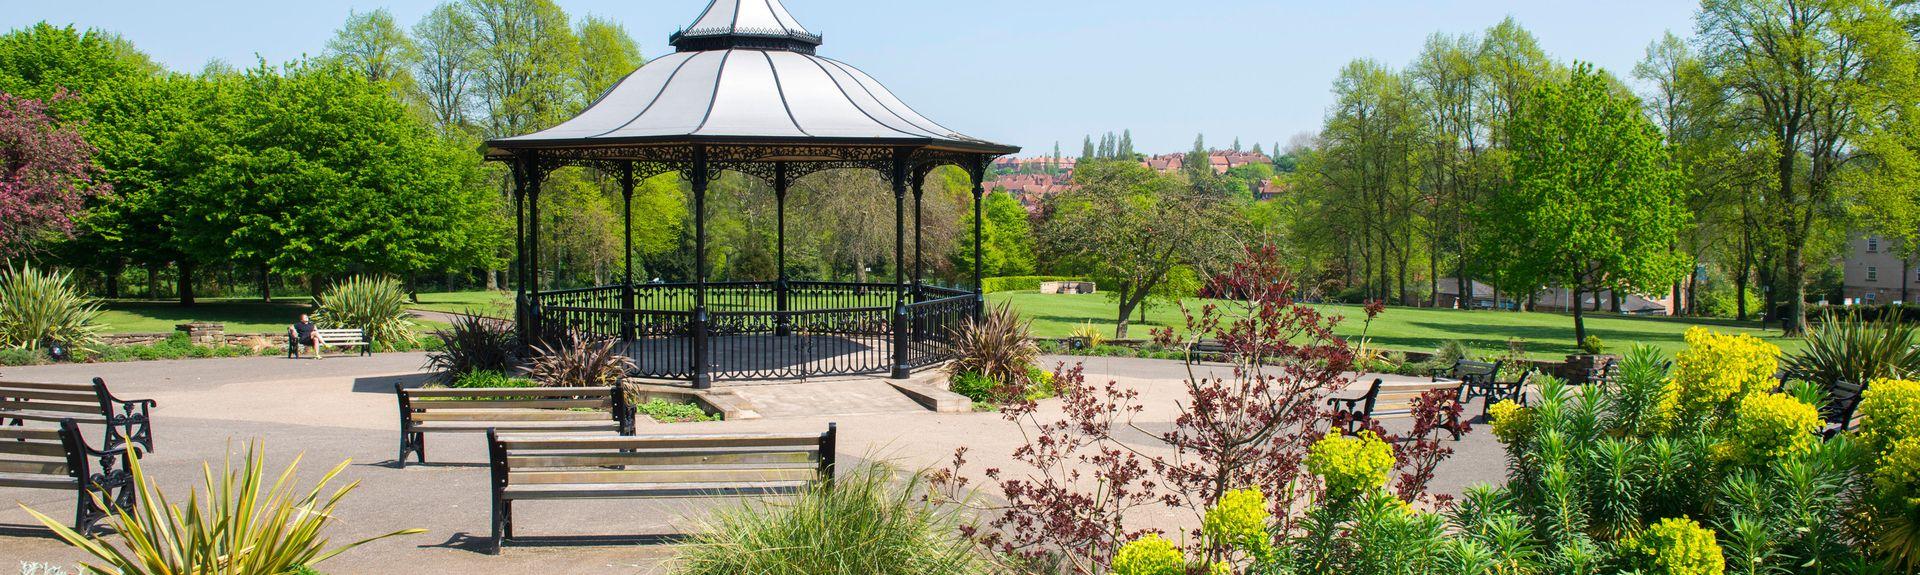 Mansfield, Nottinghamshire, UK